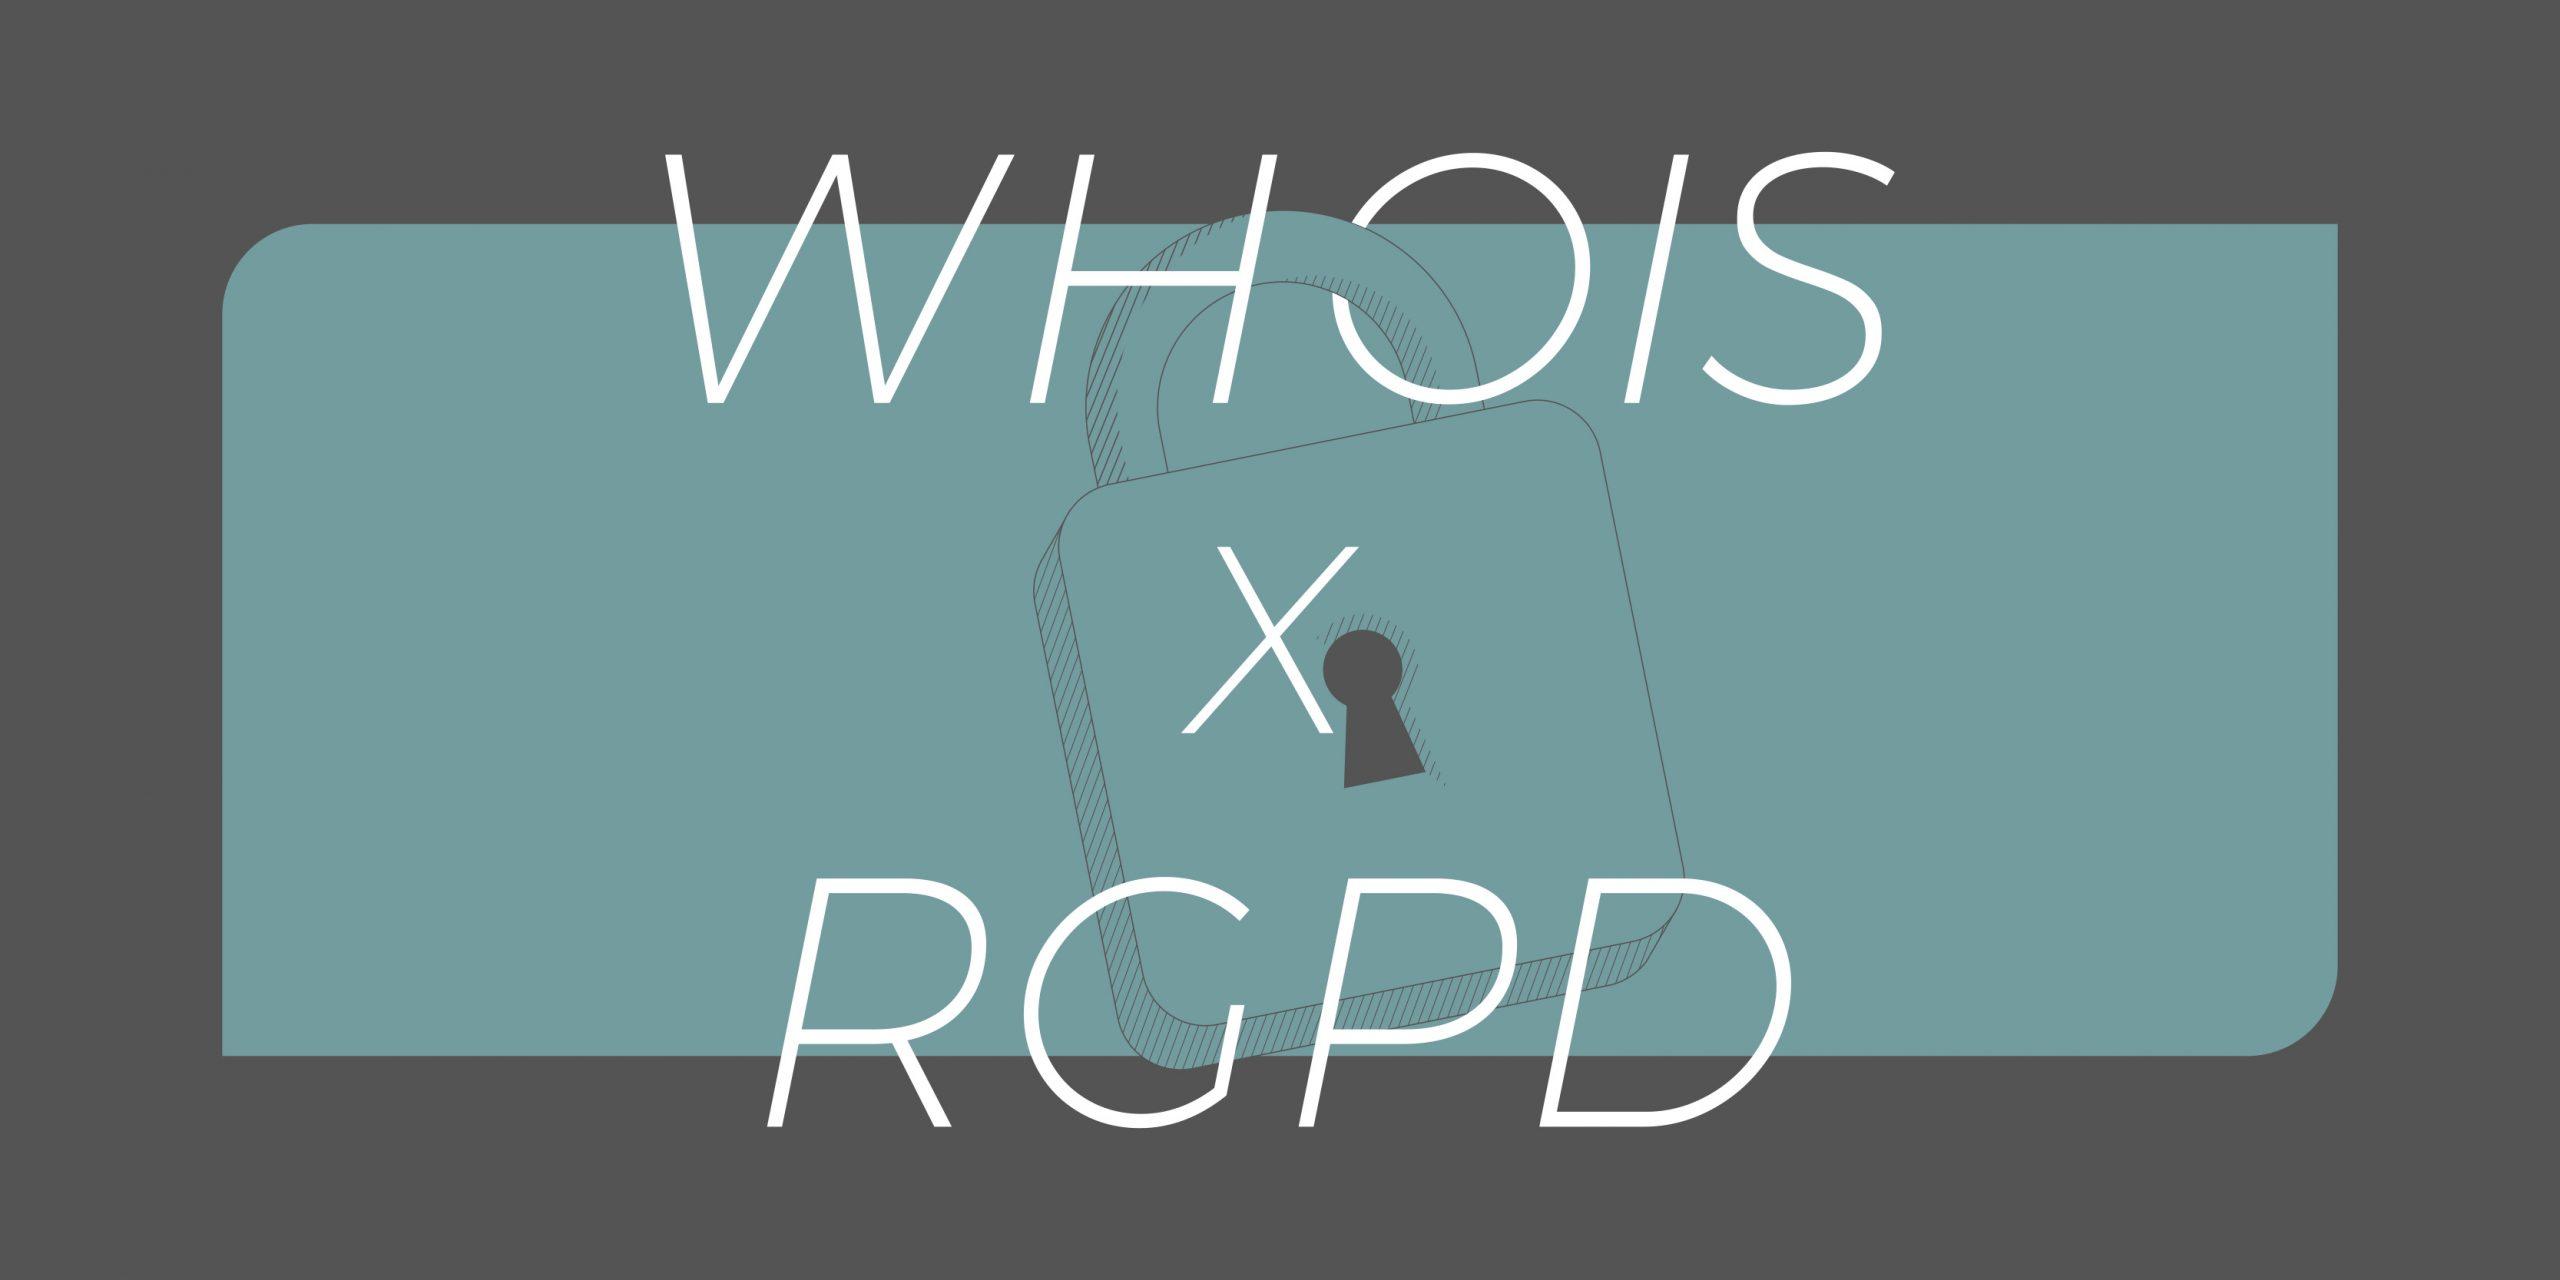 WHOIS 资料揭露与 GDPR